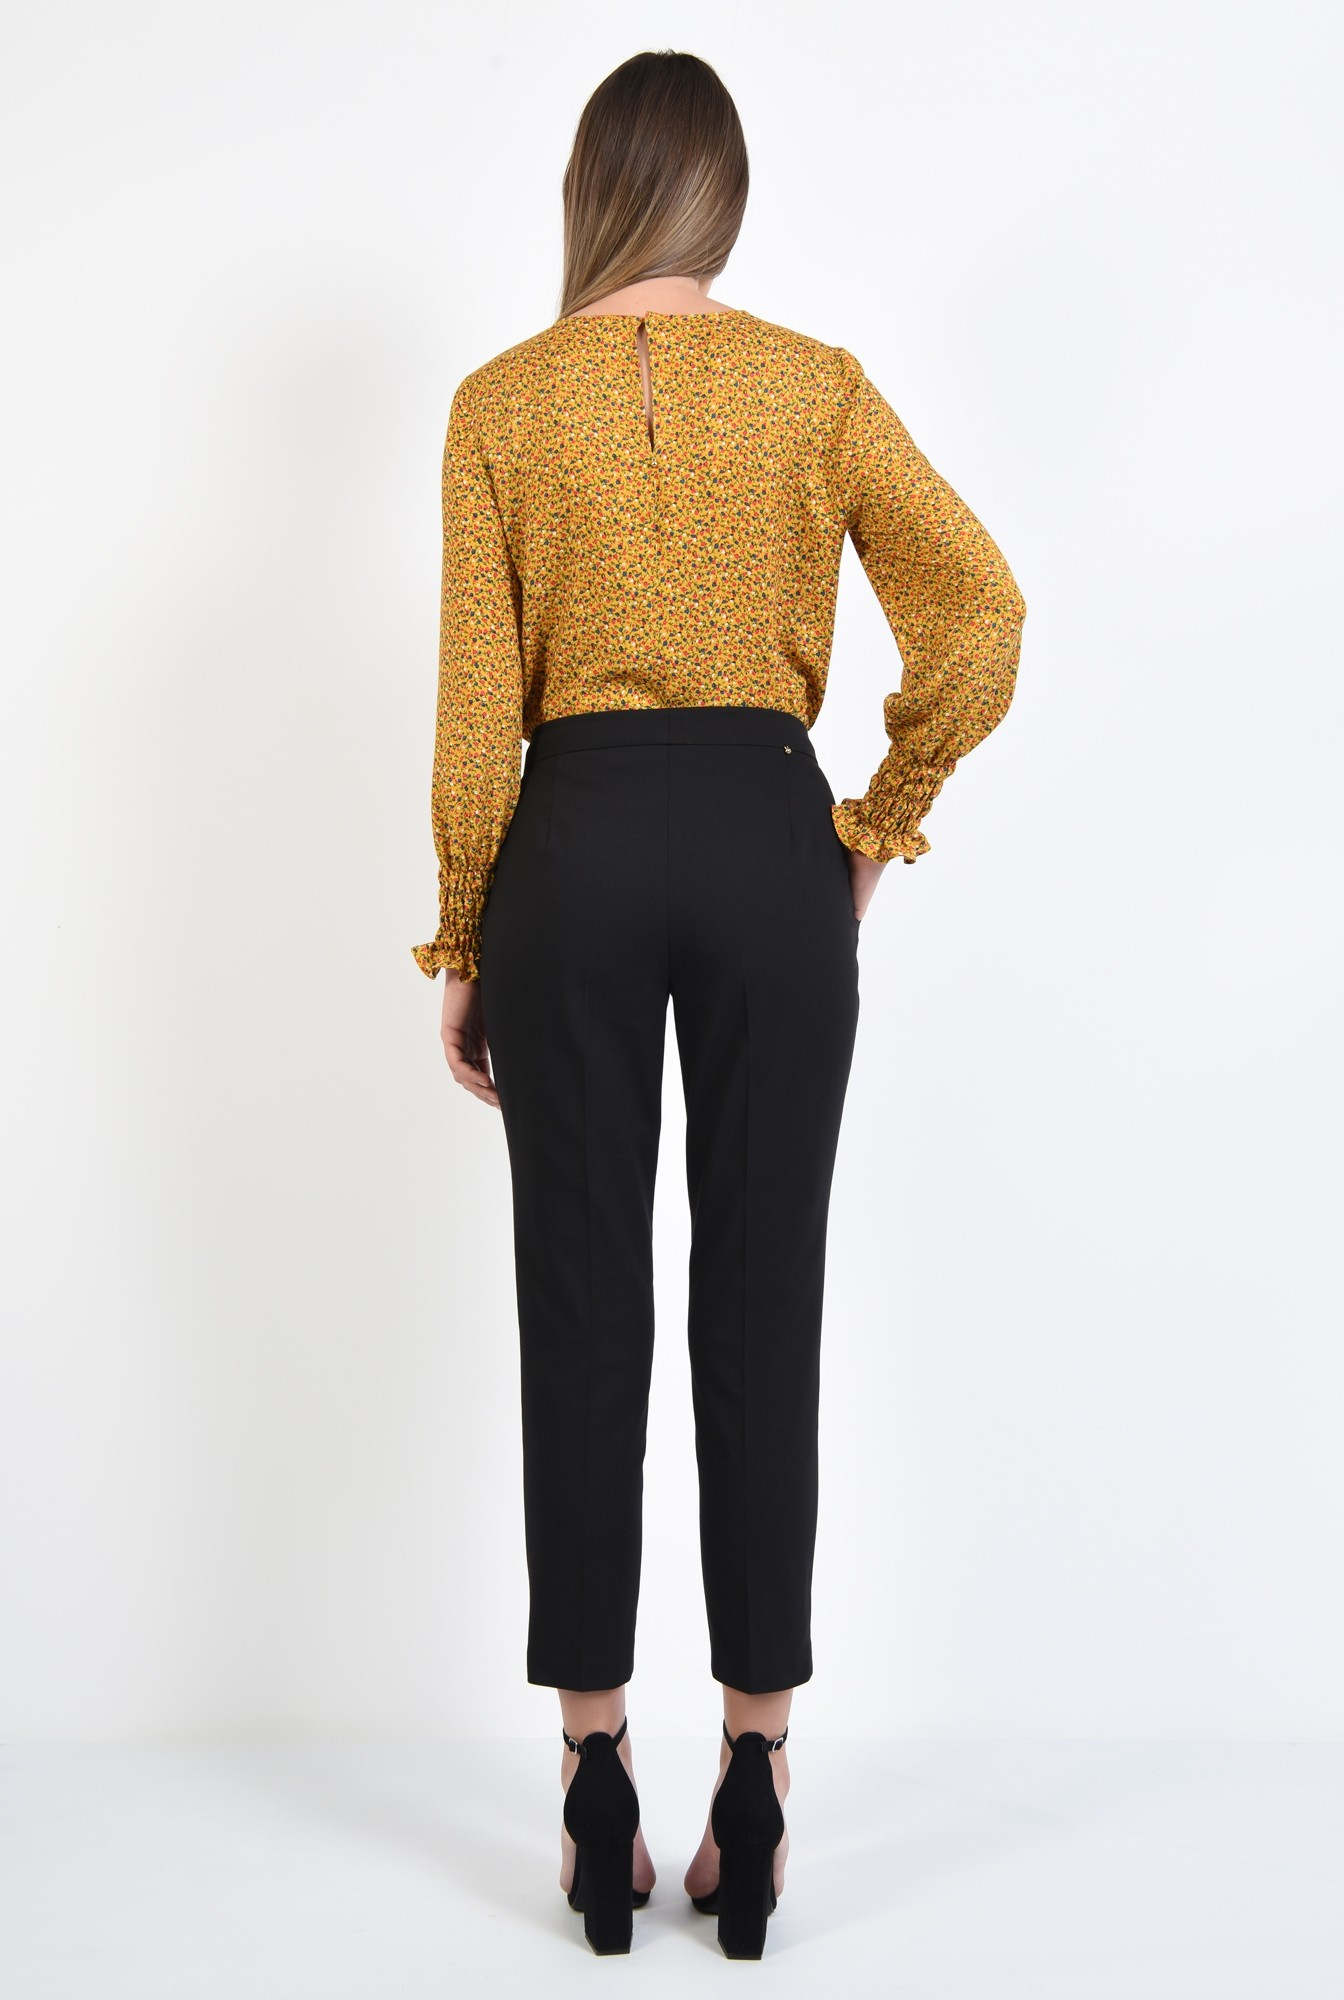 1 - 360 - bluza casual, din viscoza imprimata, maneci lungi cu mansete elastice